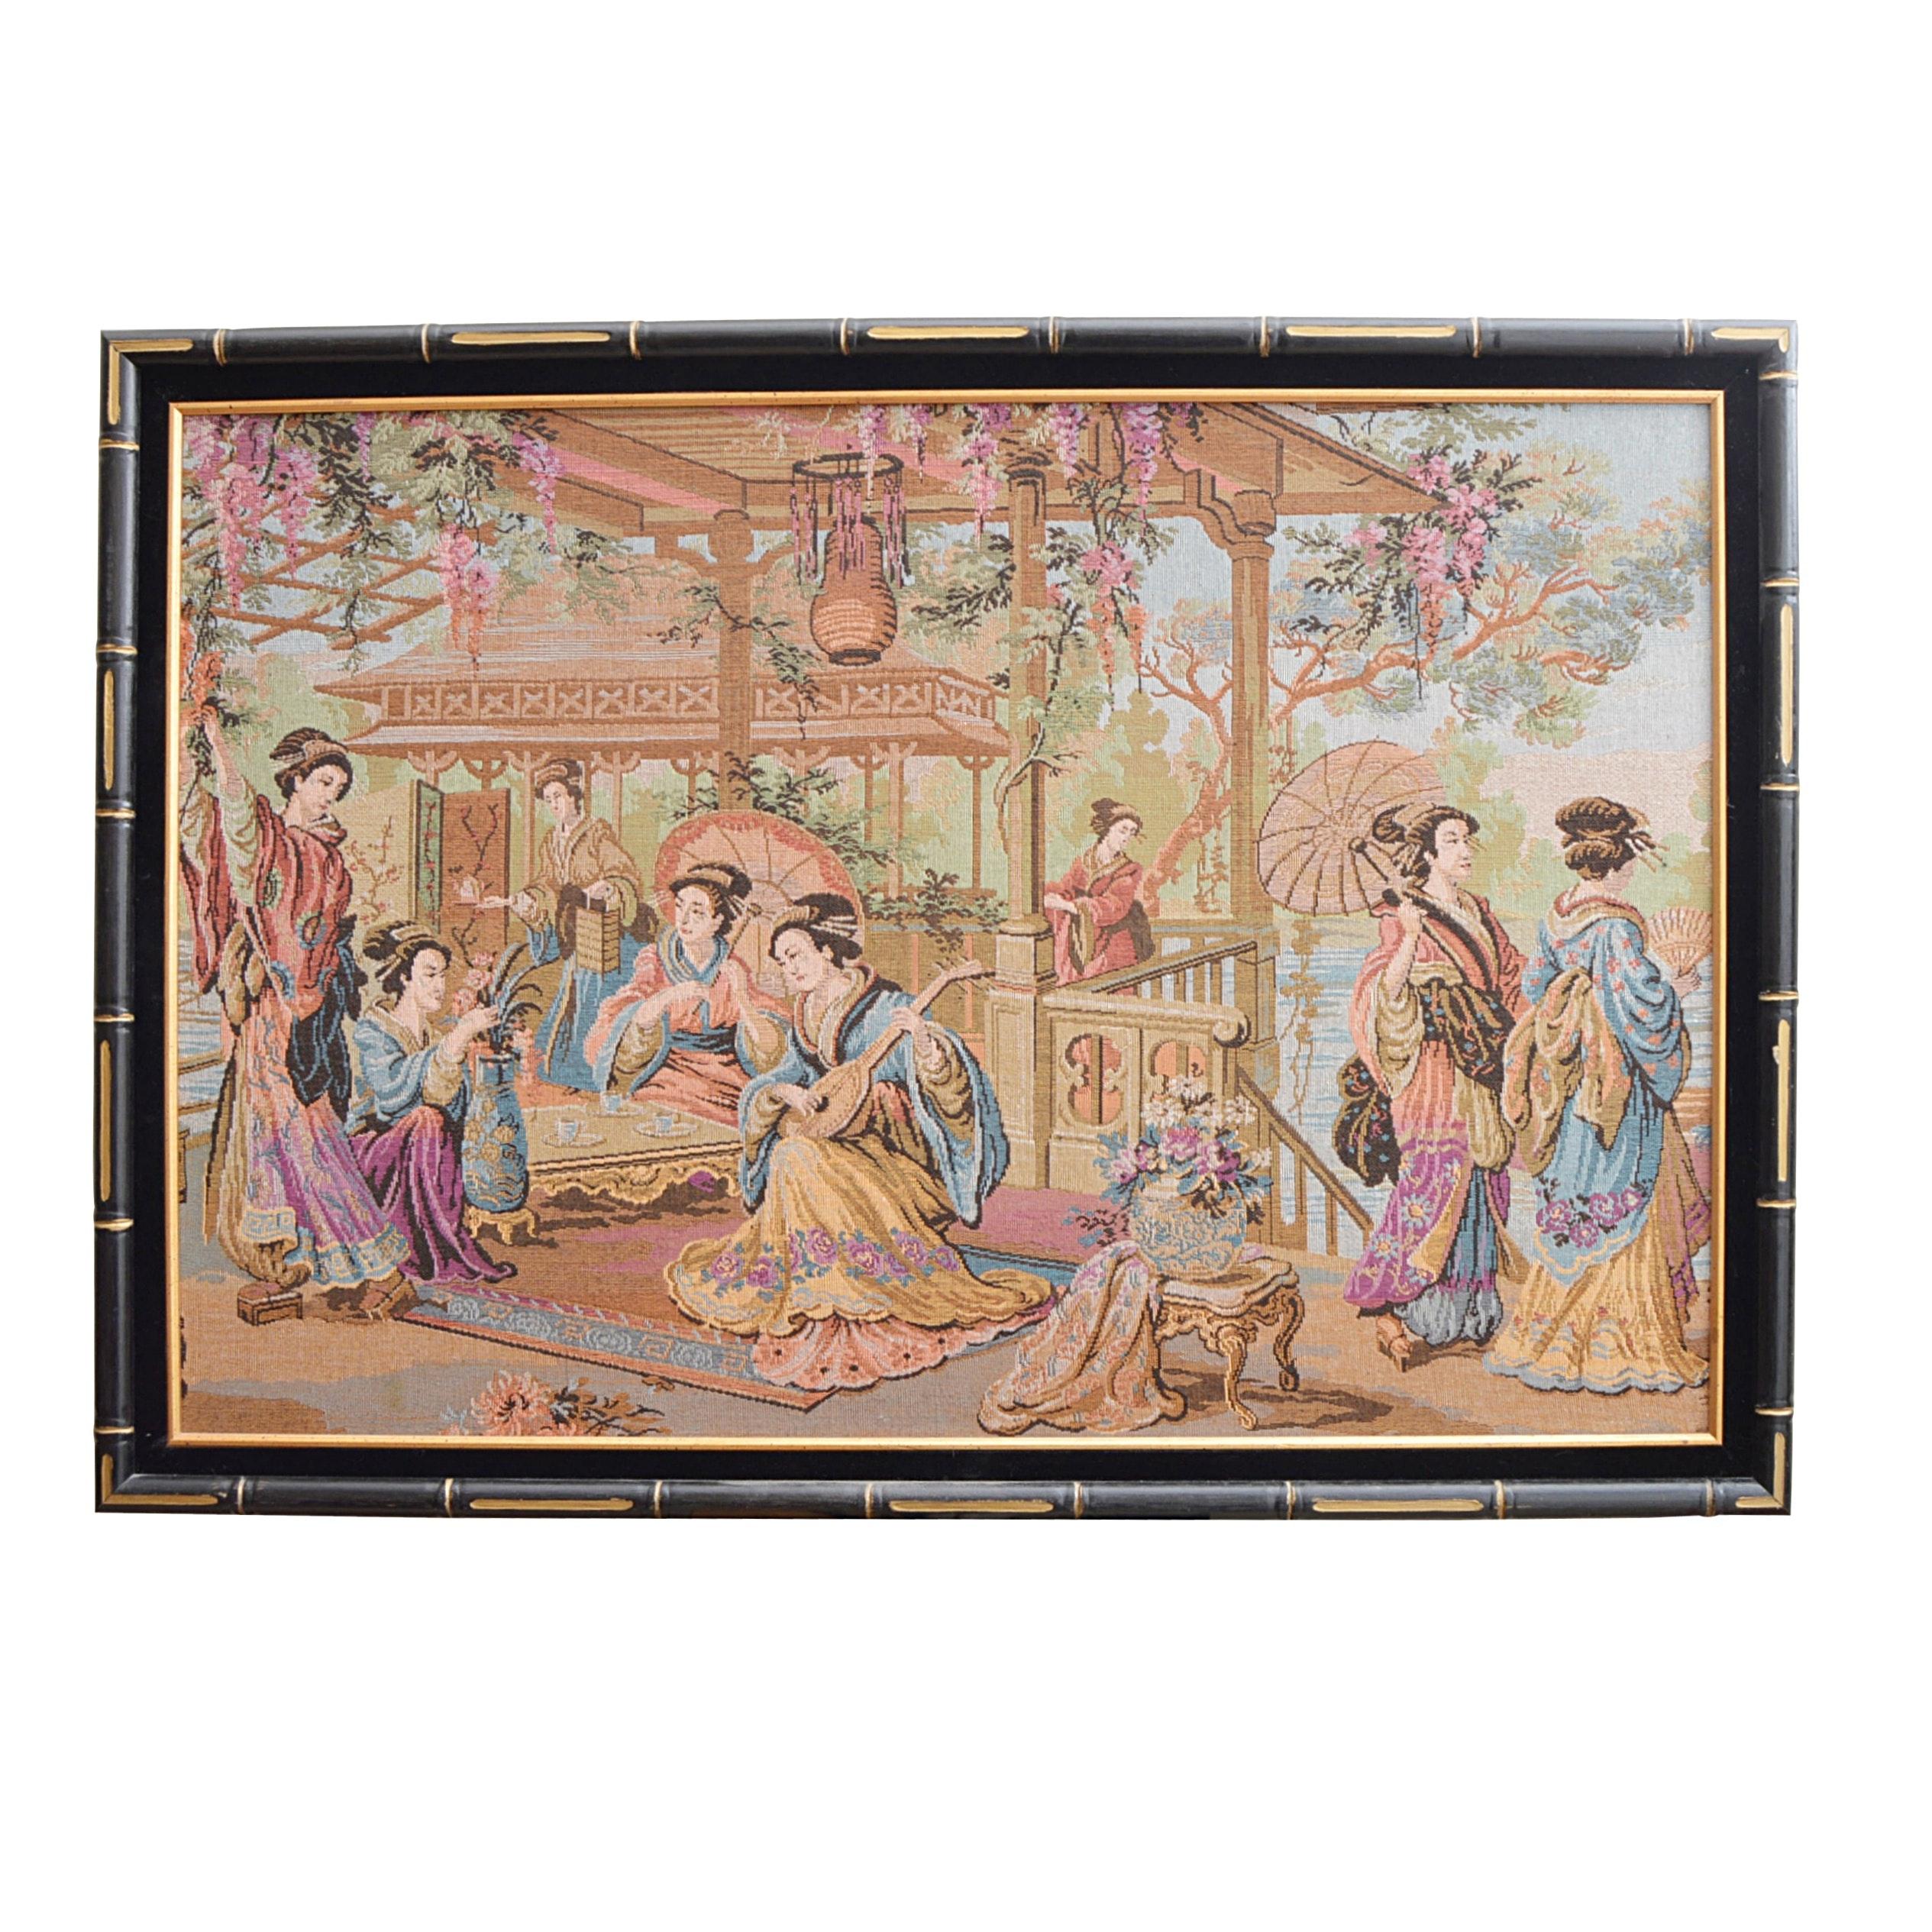 Vintage Japanese Inspired Tapestry